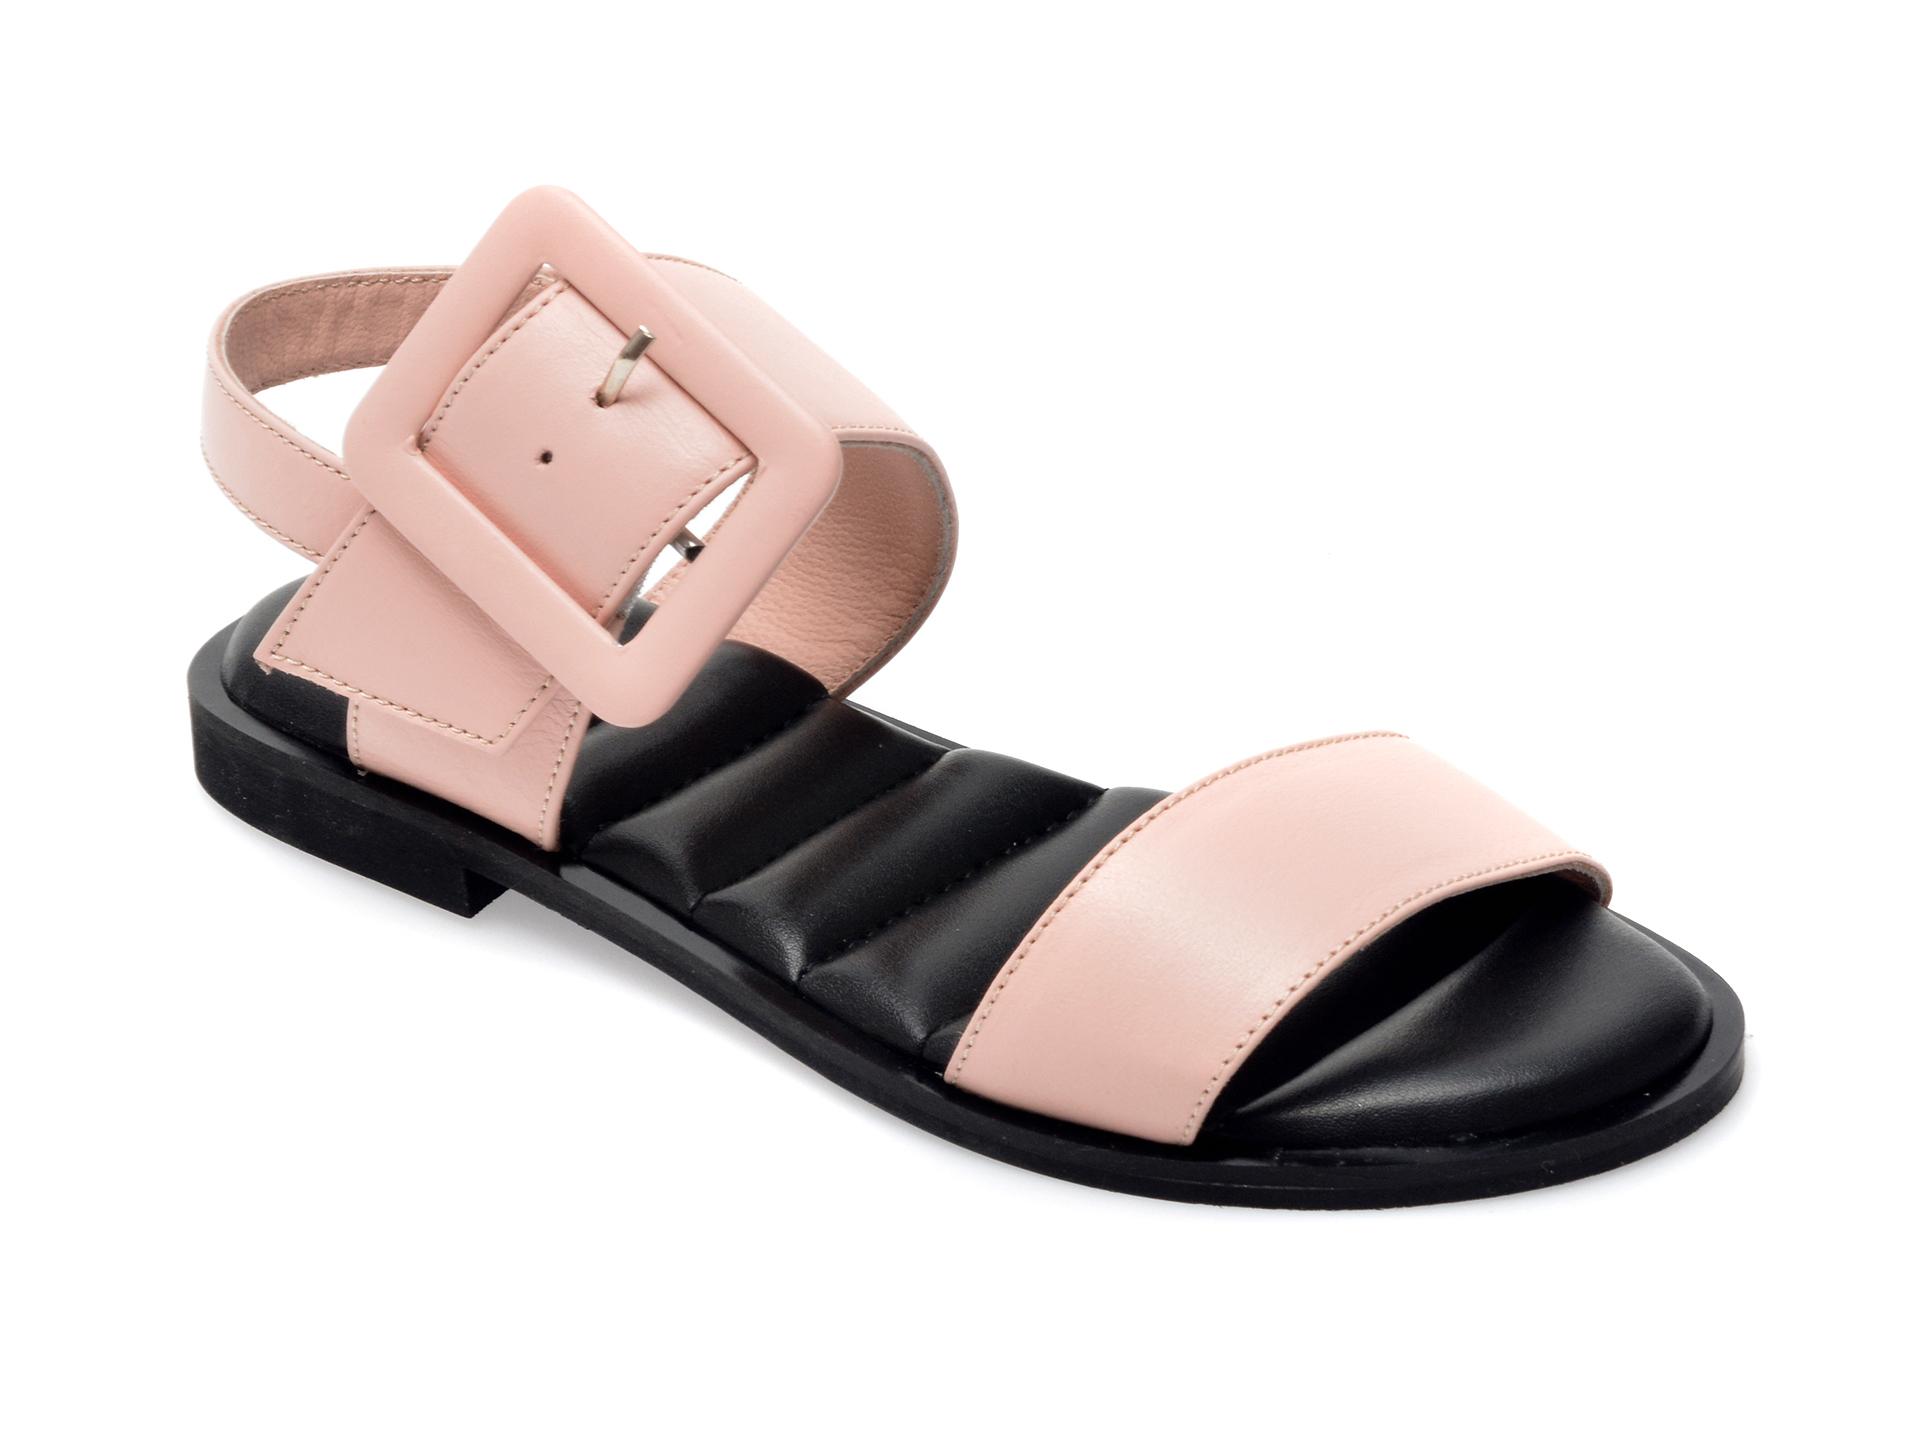 Sandale UNICA nude, A6628, din piele naturala imagine otter.ro 2021